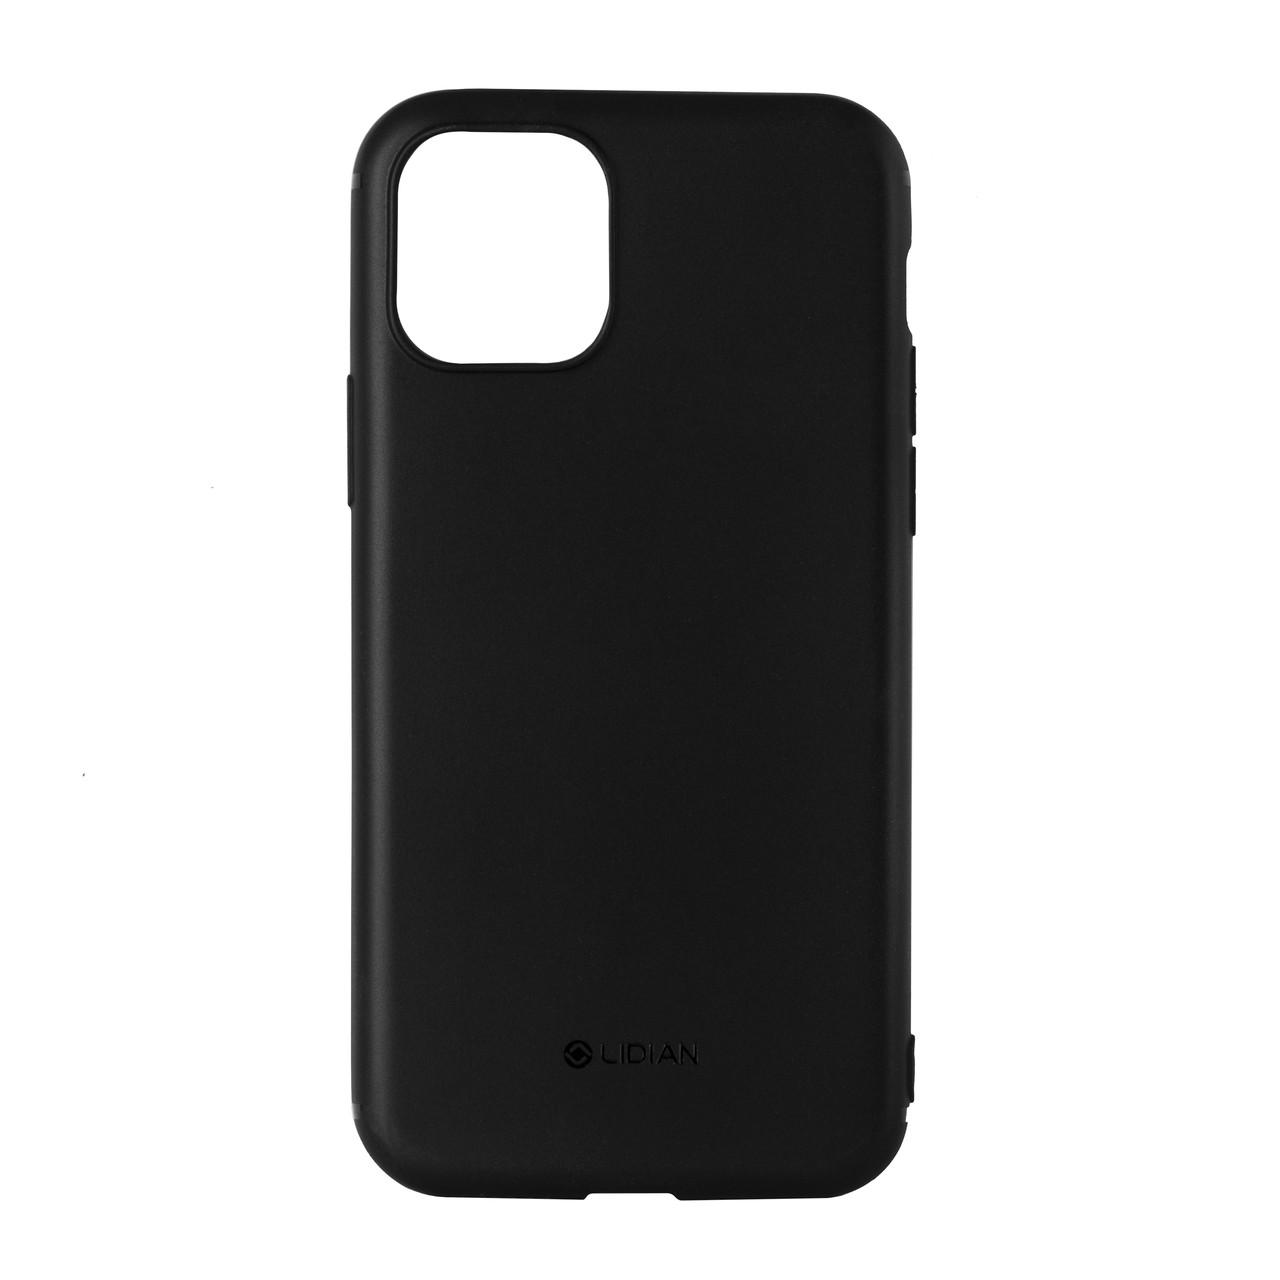 Чехол для Apple iPhone 11 Pro (5.8*) back cover gel Lidian Thin Silicone Soft Black